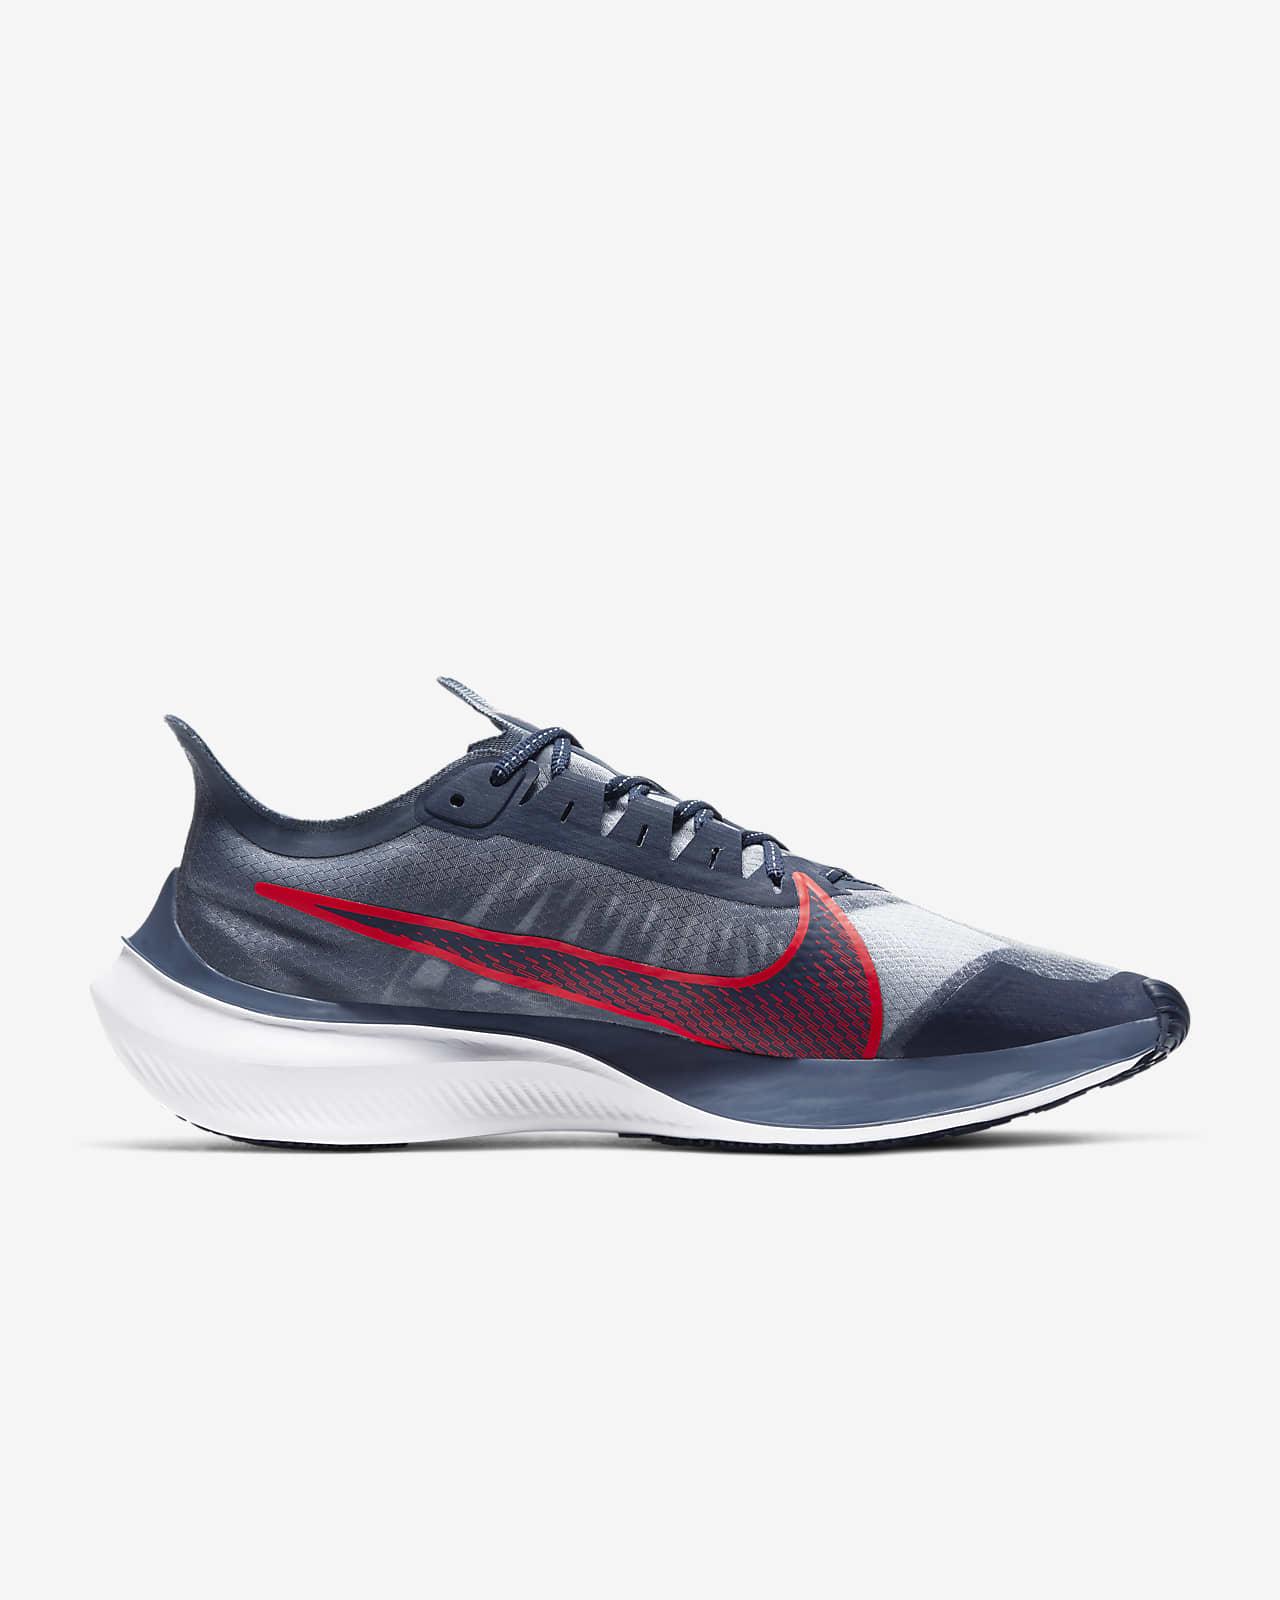 Calzado de running para hombre Nike Zoom Gravity